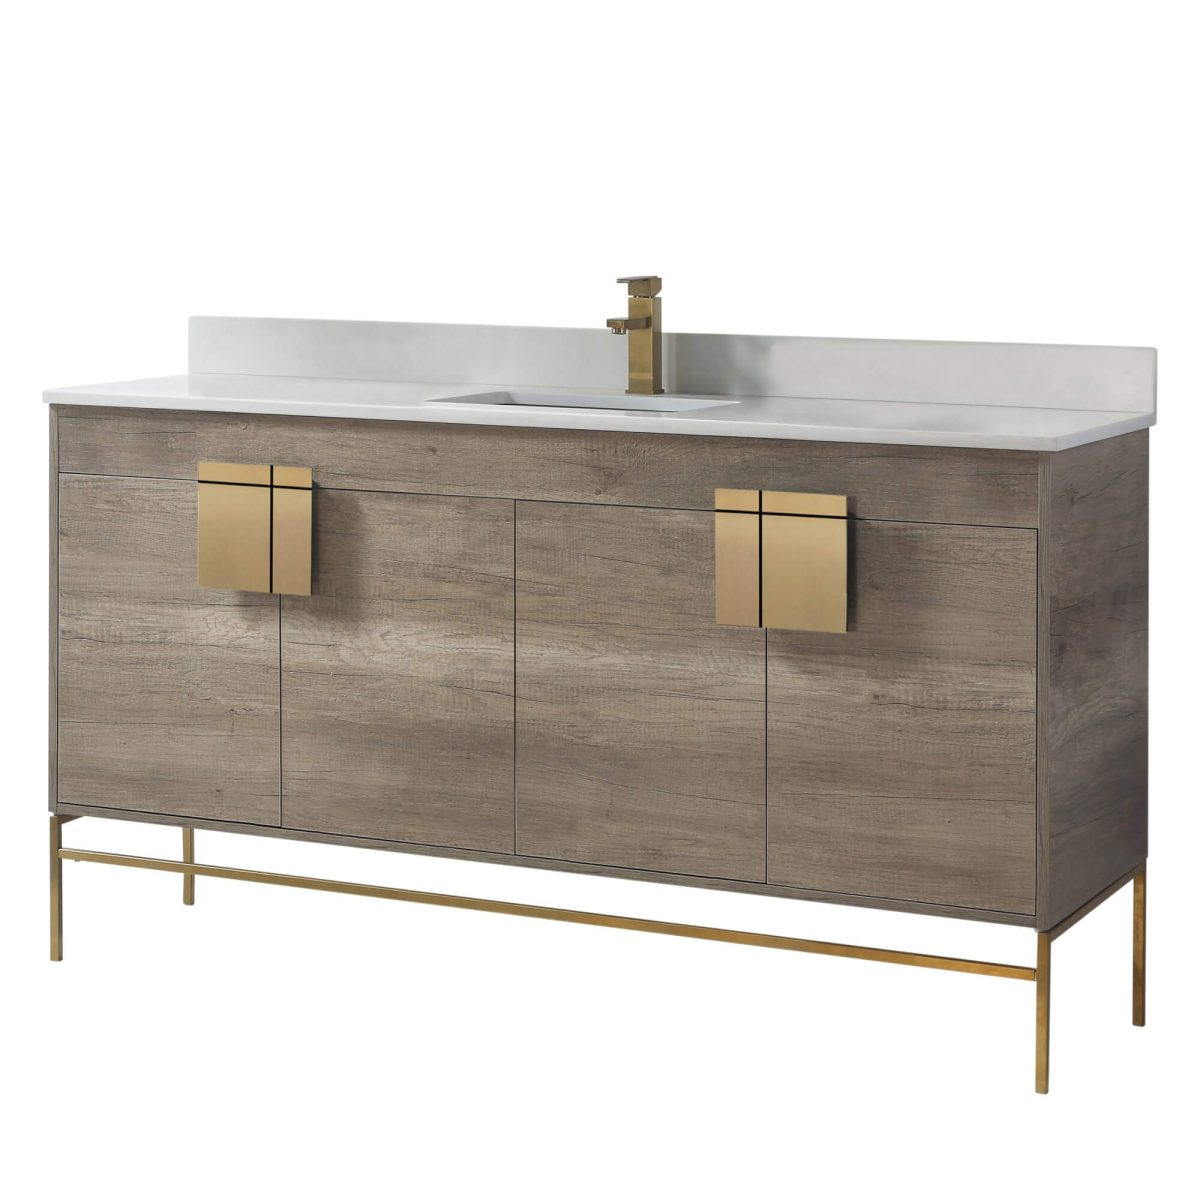 "Shawbridge 60"" Modern Single Bathroom Vanity  Shadow Gray with Satin Brass Hardware"